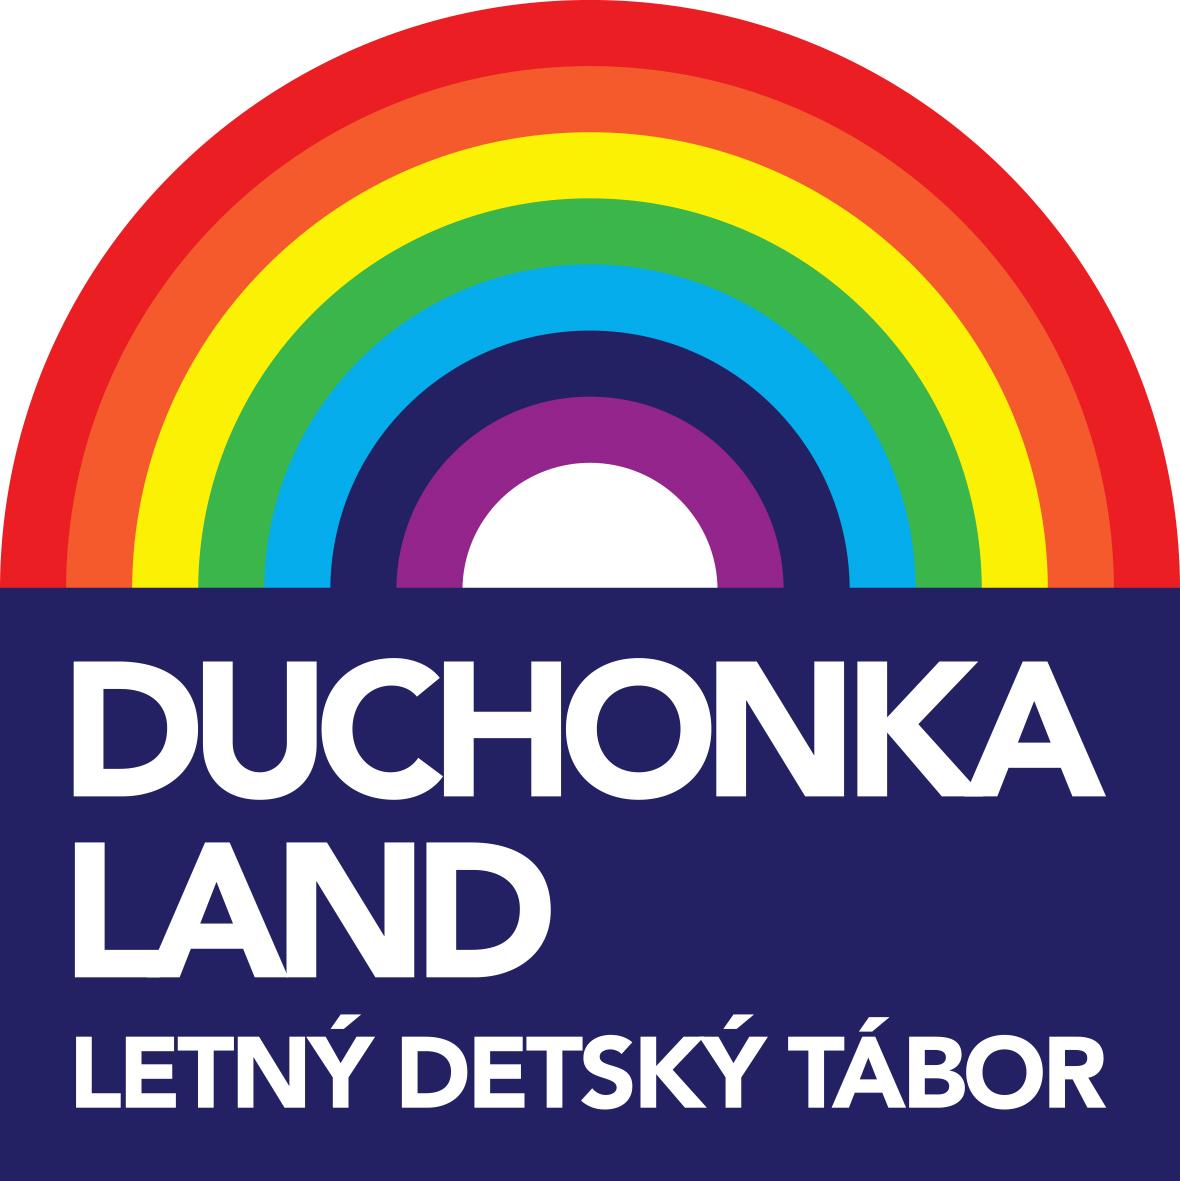 77edcc7ef296 Letný tábor DUCHONKA LAND - skvelé zážitky a st - Kariéra